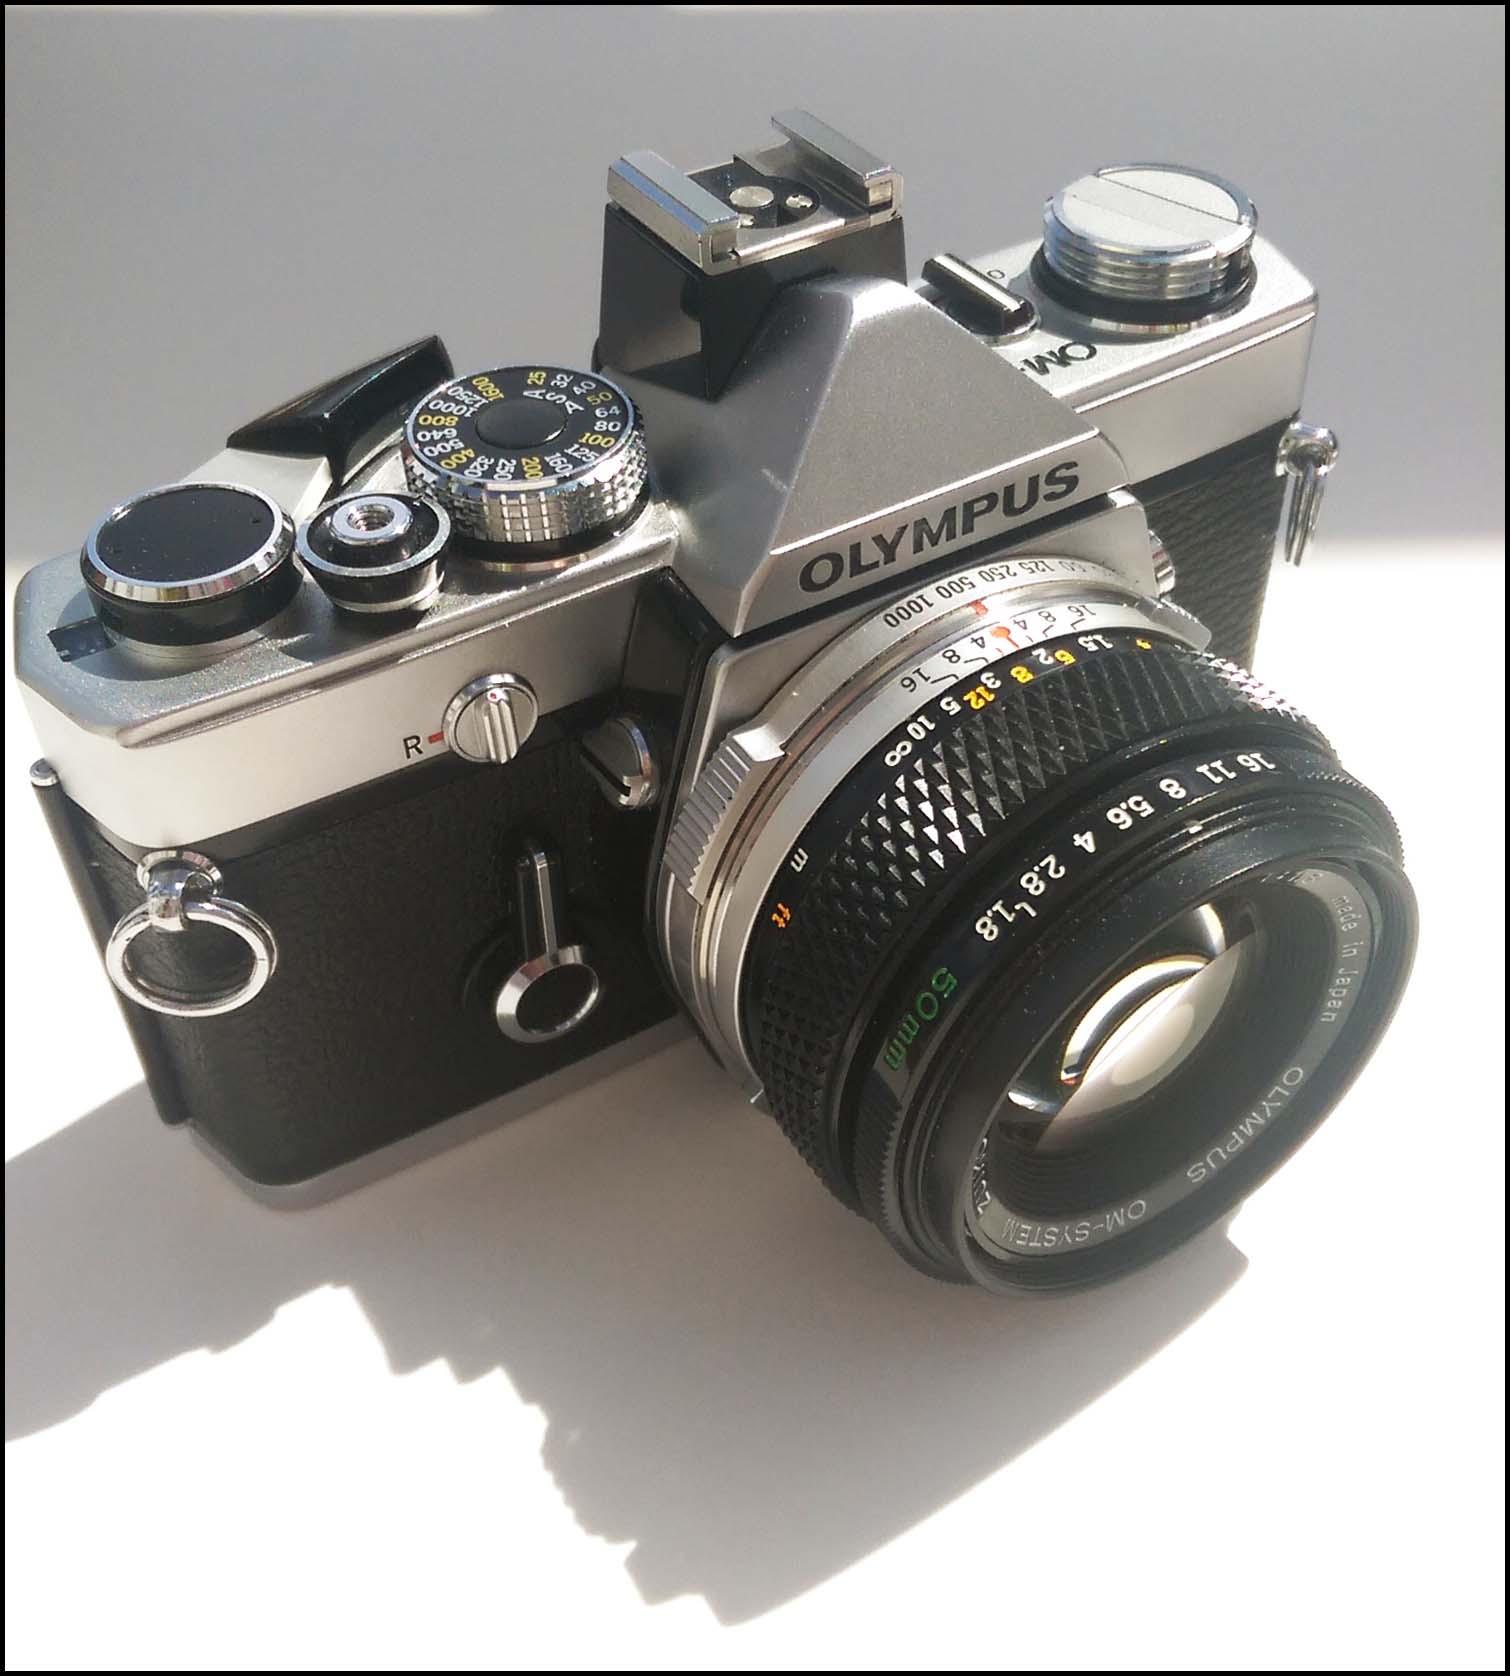 Olympus OM 1 vintage camera